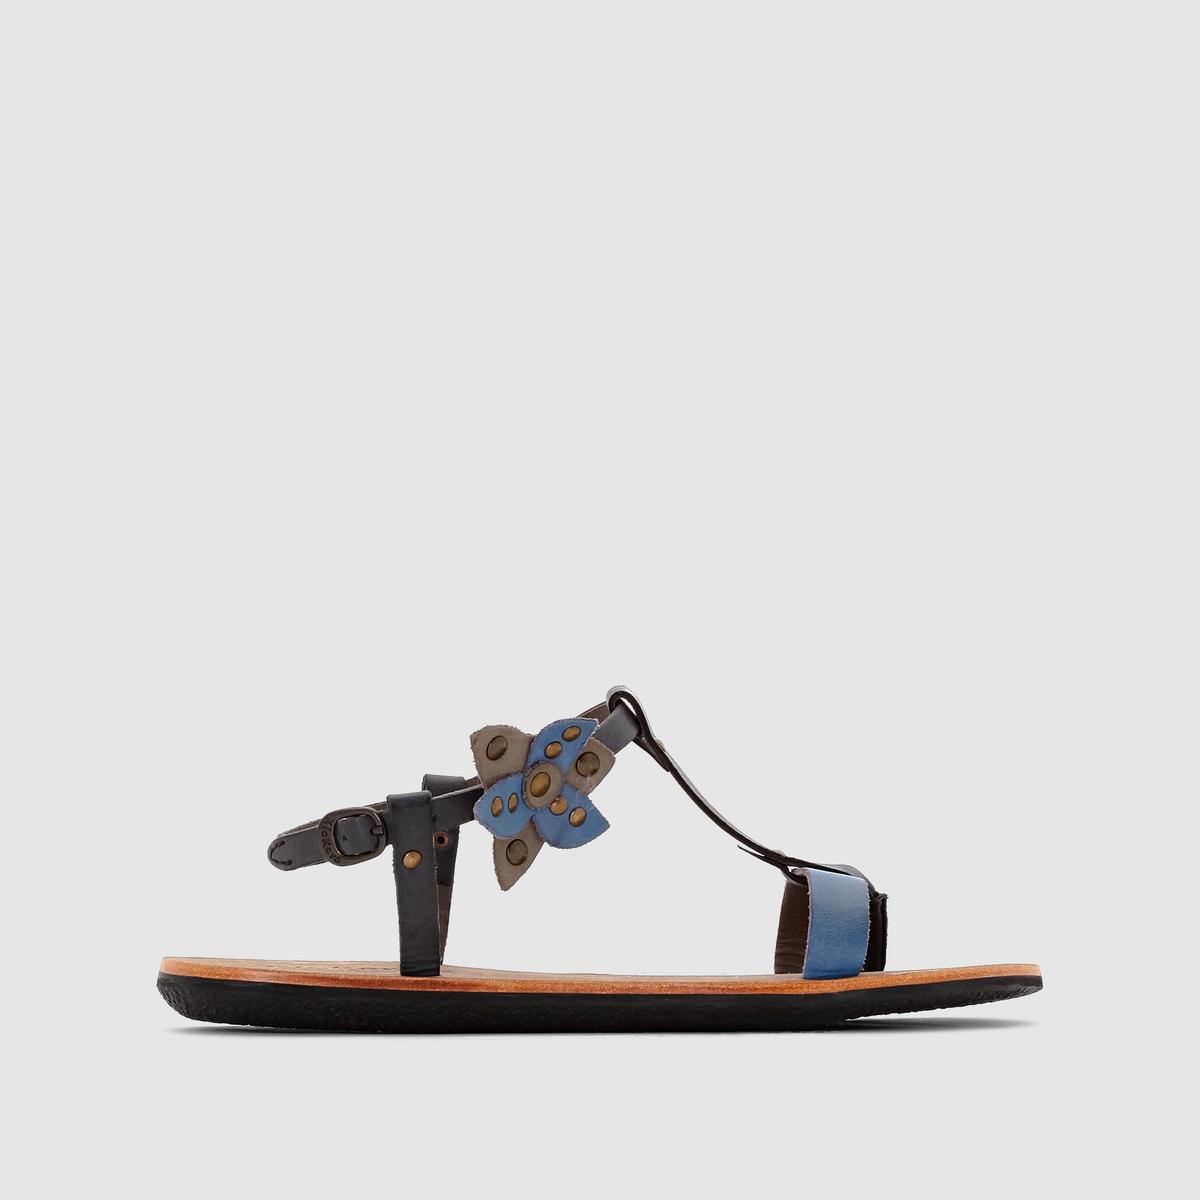 Сандалии кожаные на низком каблуке Spartflower